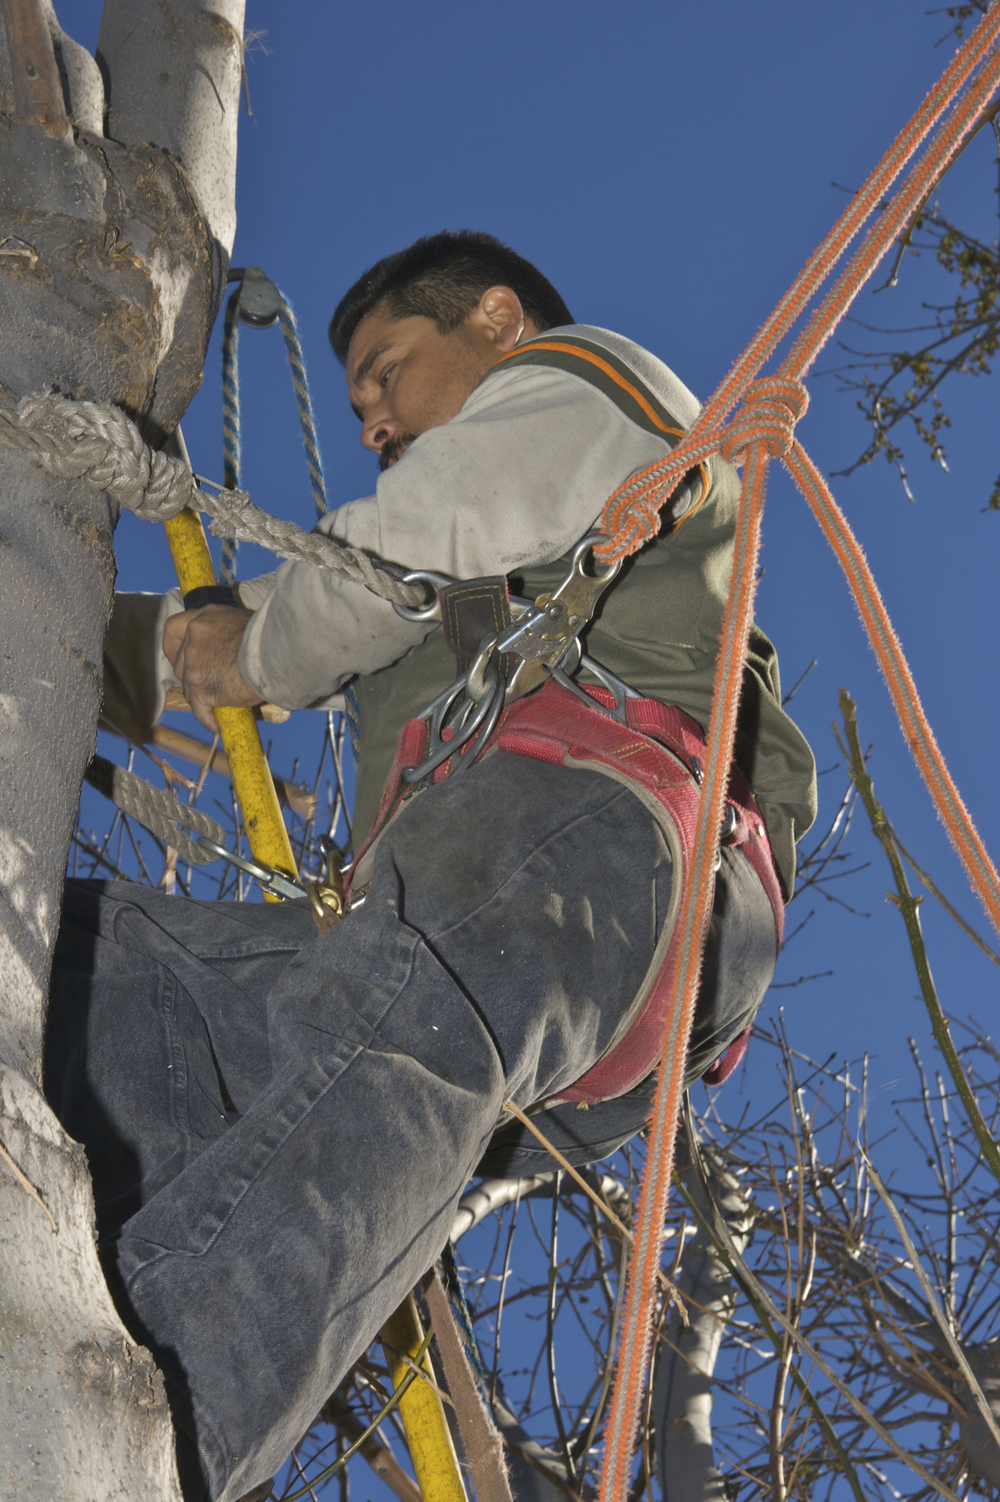 Rope, arborist, climbing